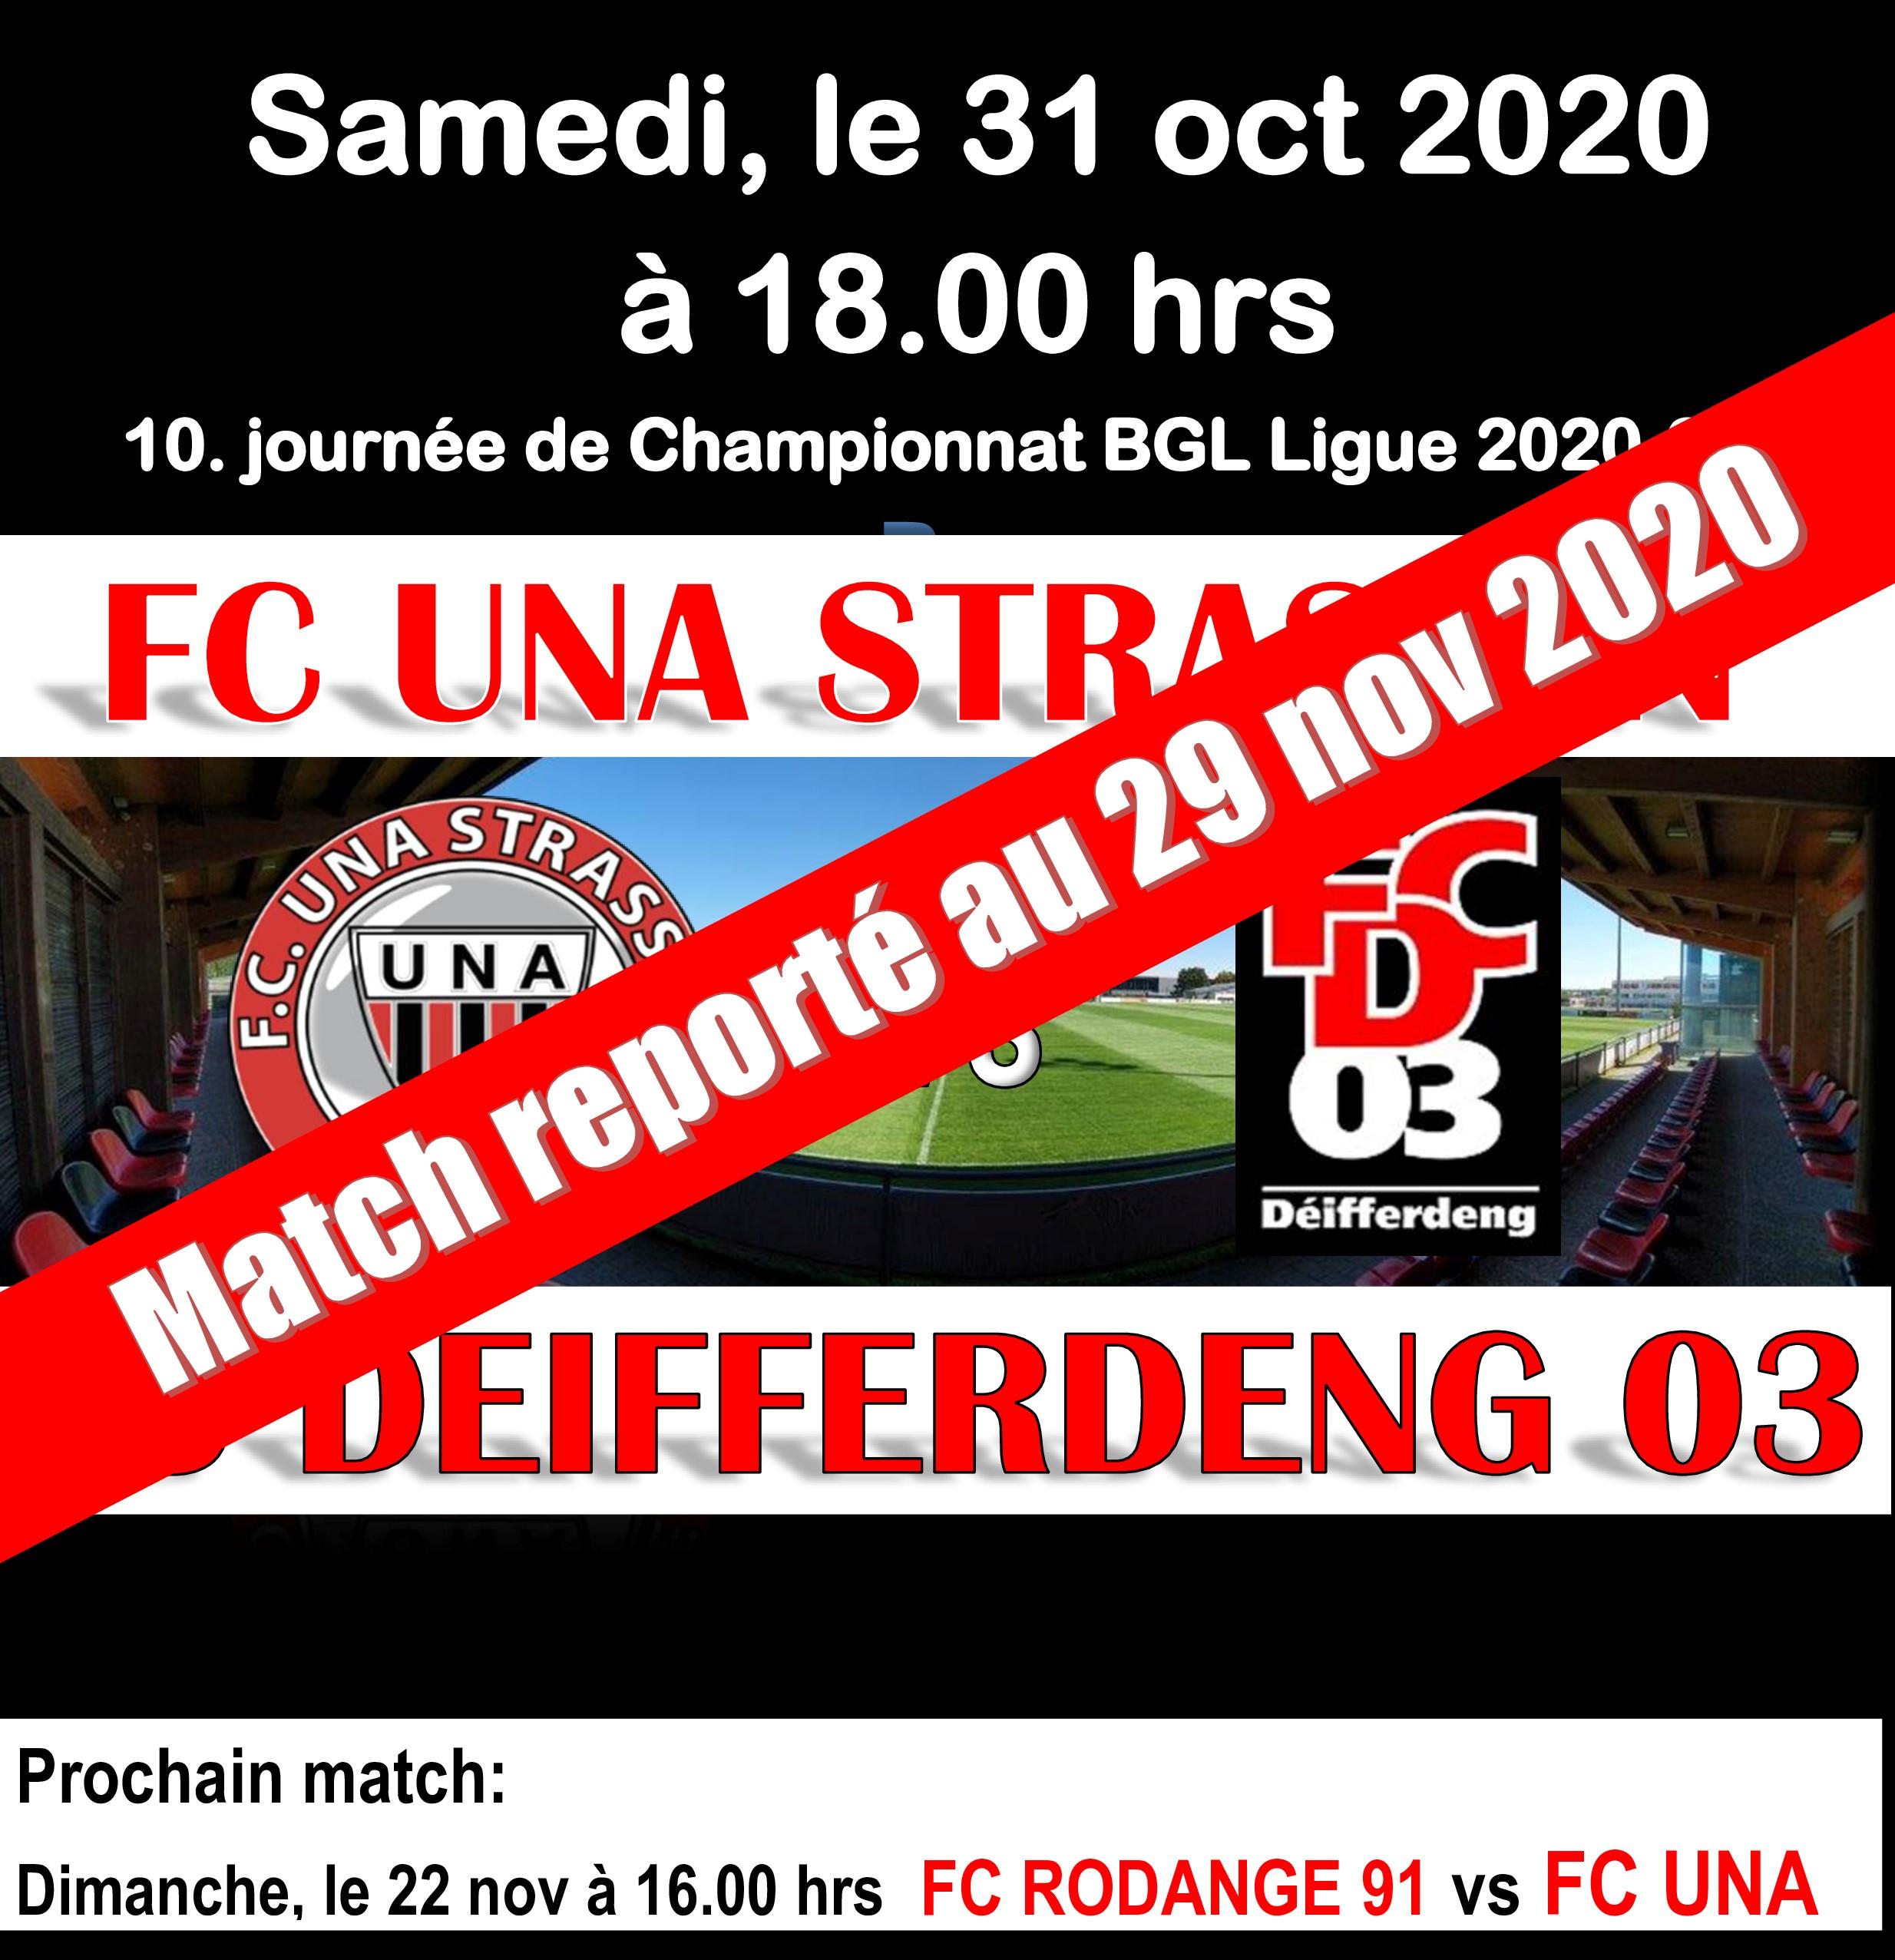 Match de championnat UNA - FC Differdange 03, le samedi 31.10, 18.00 hrs